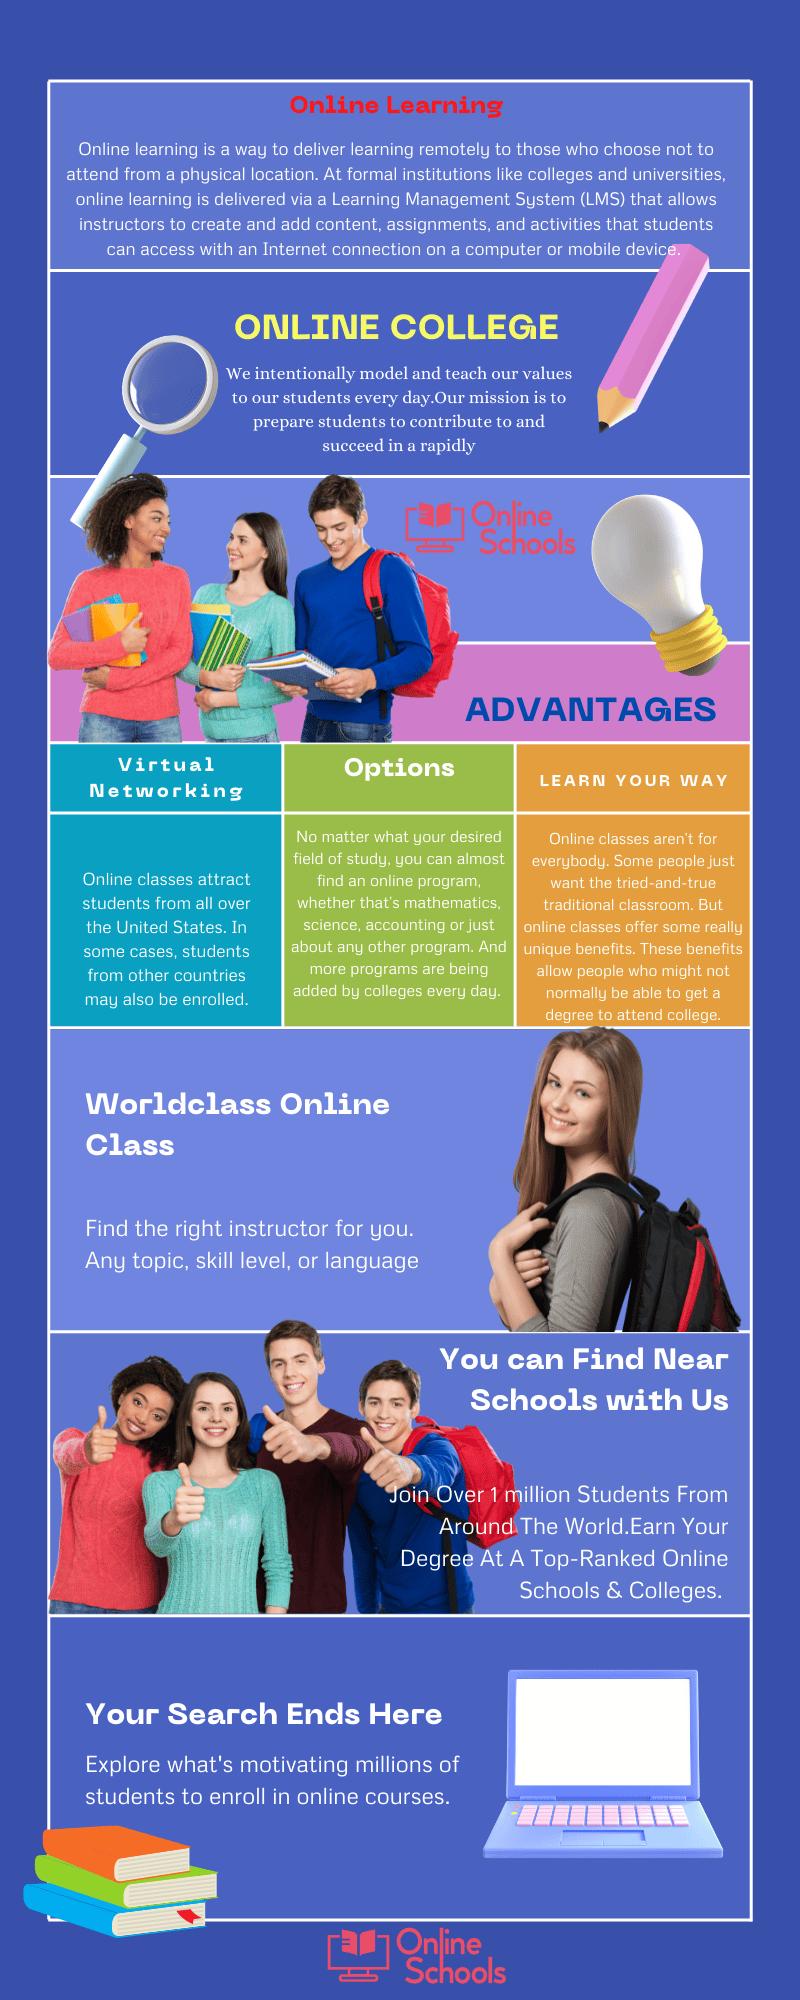 advantages of online college